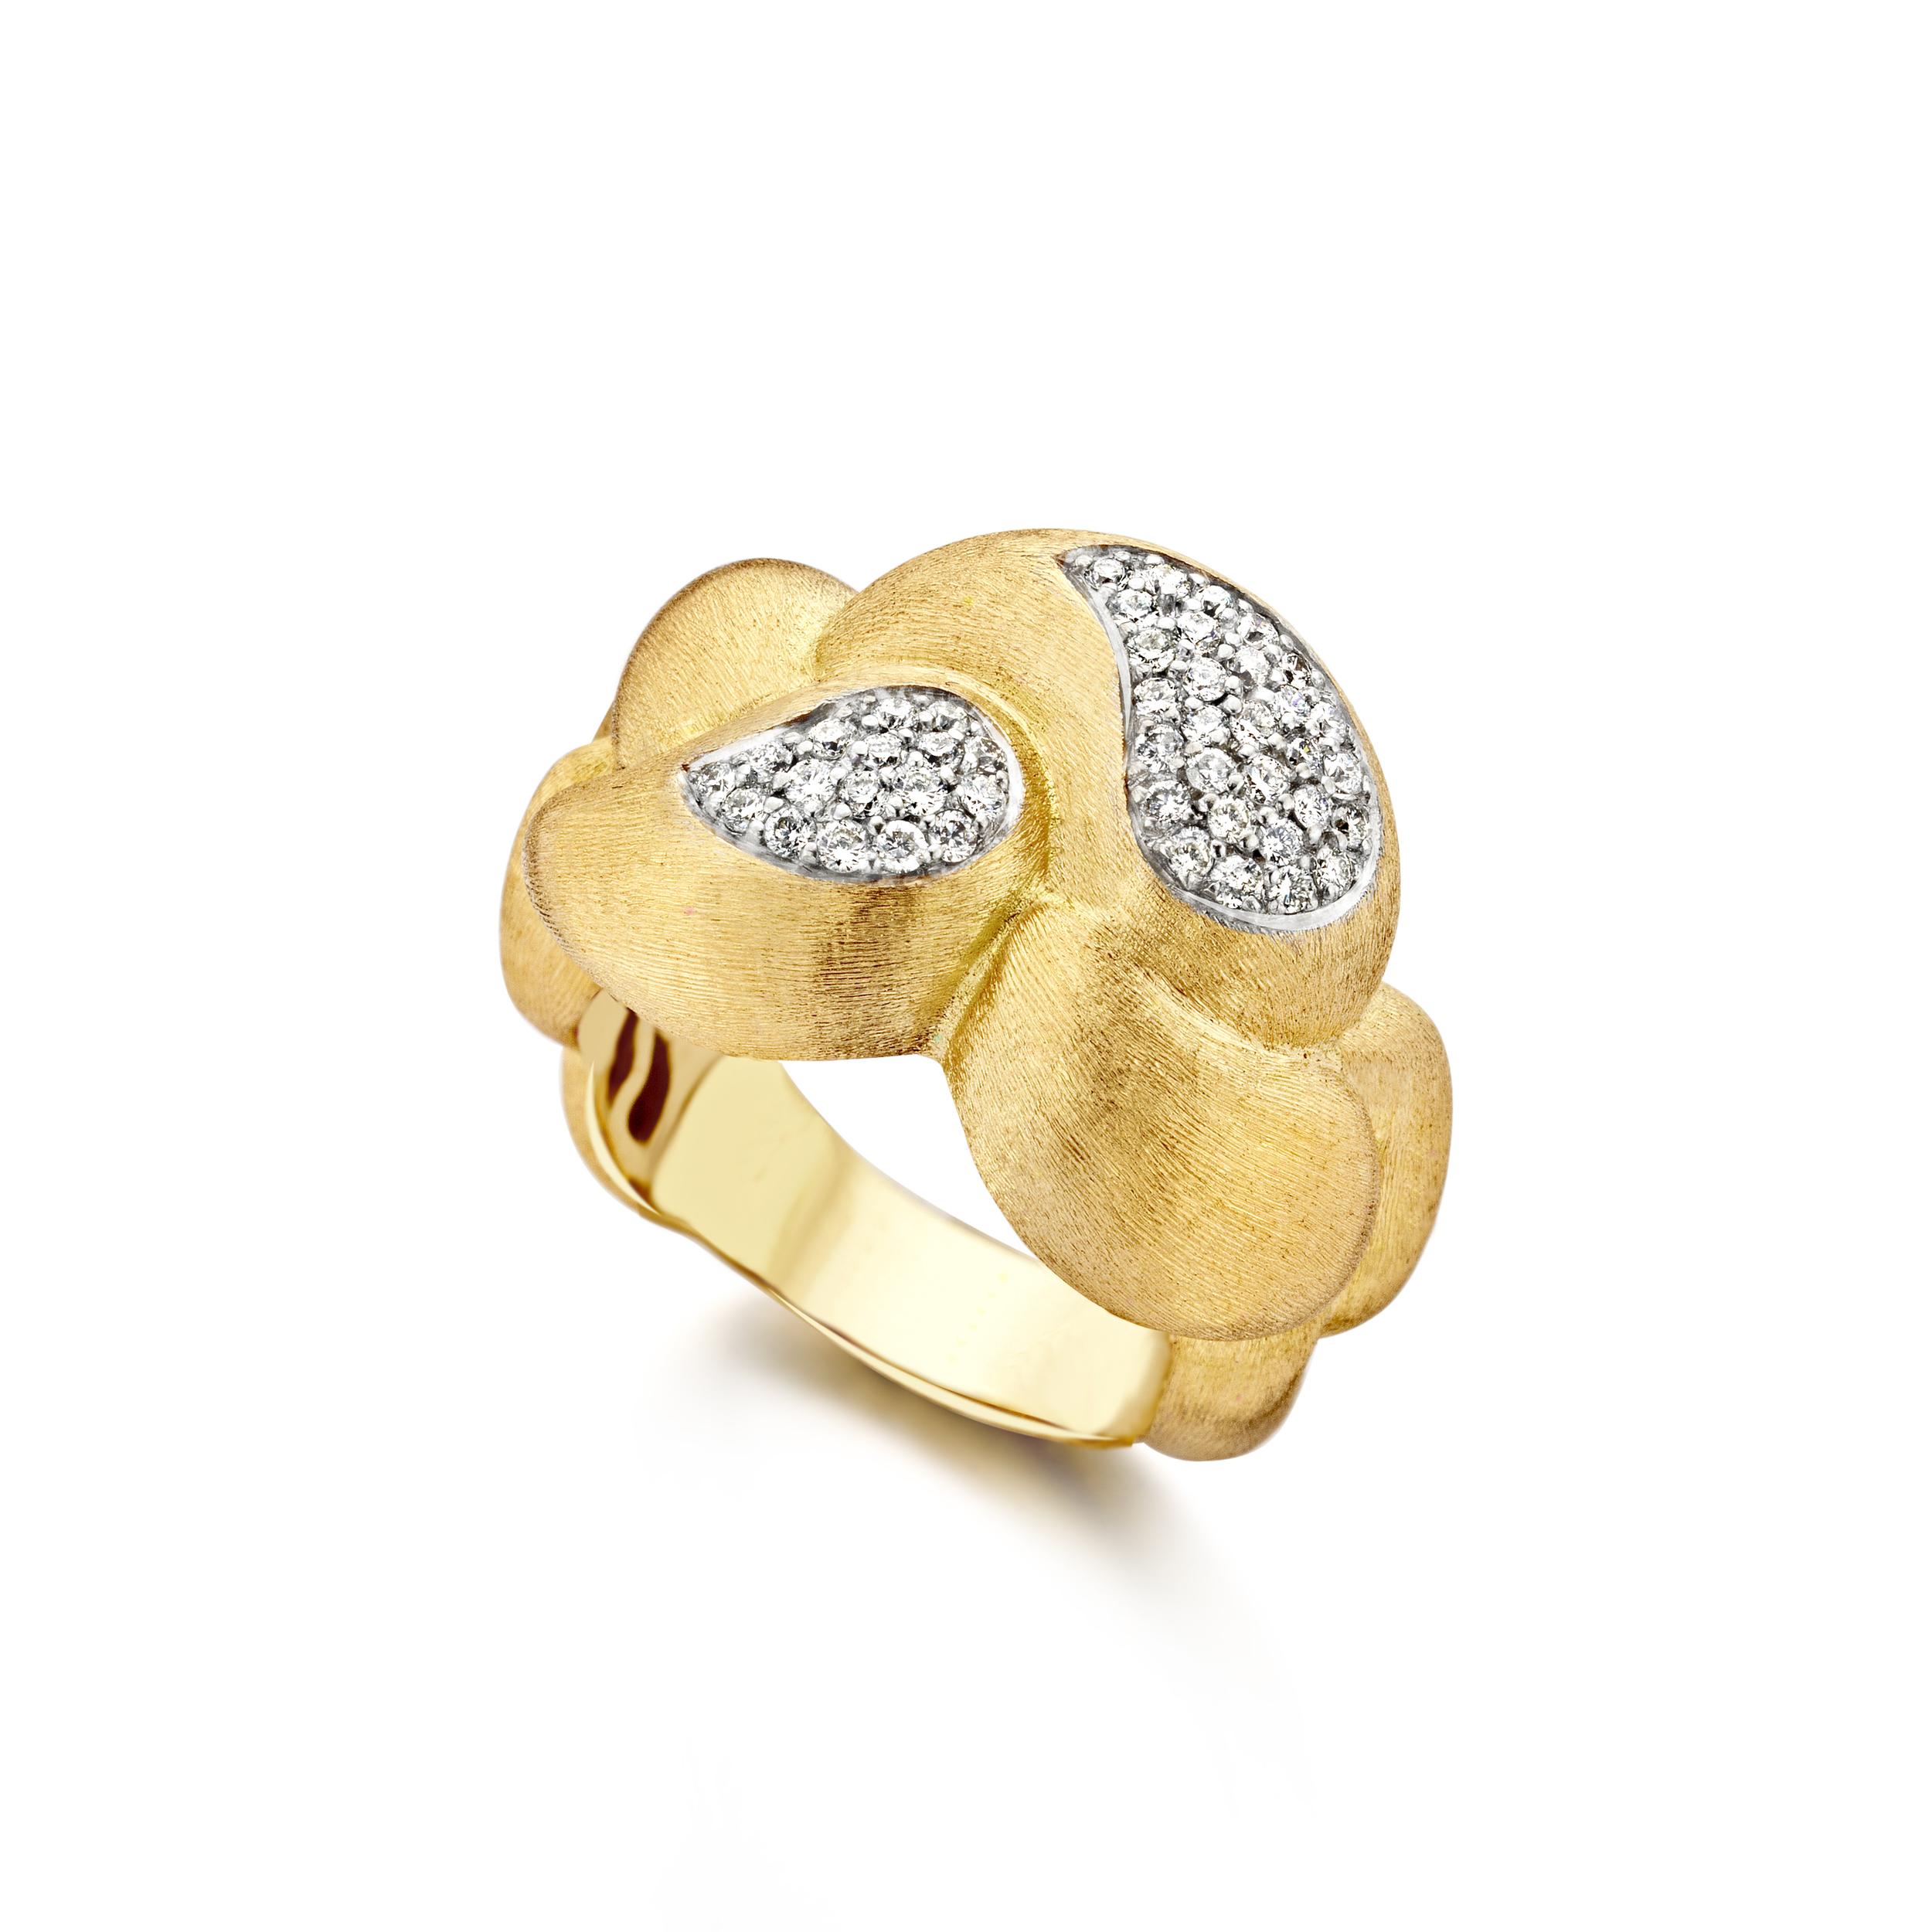 Ring Nanis | Camarillo Jewelers | Van Gundys